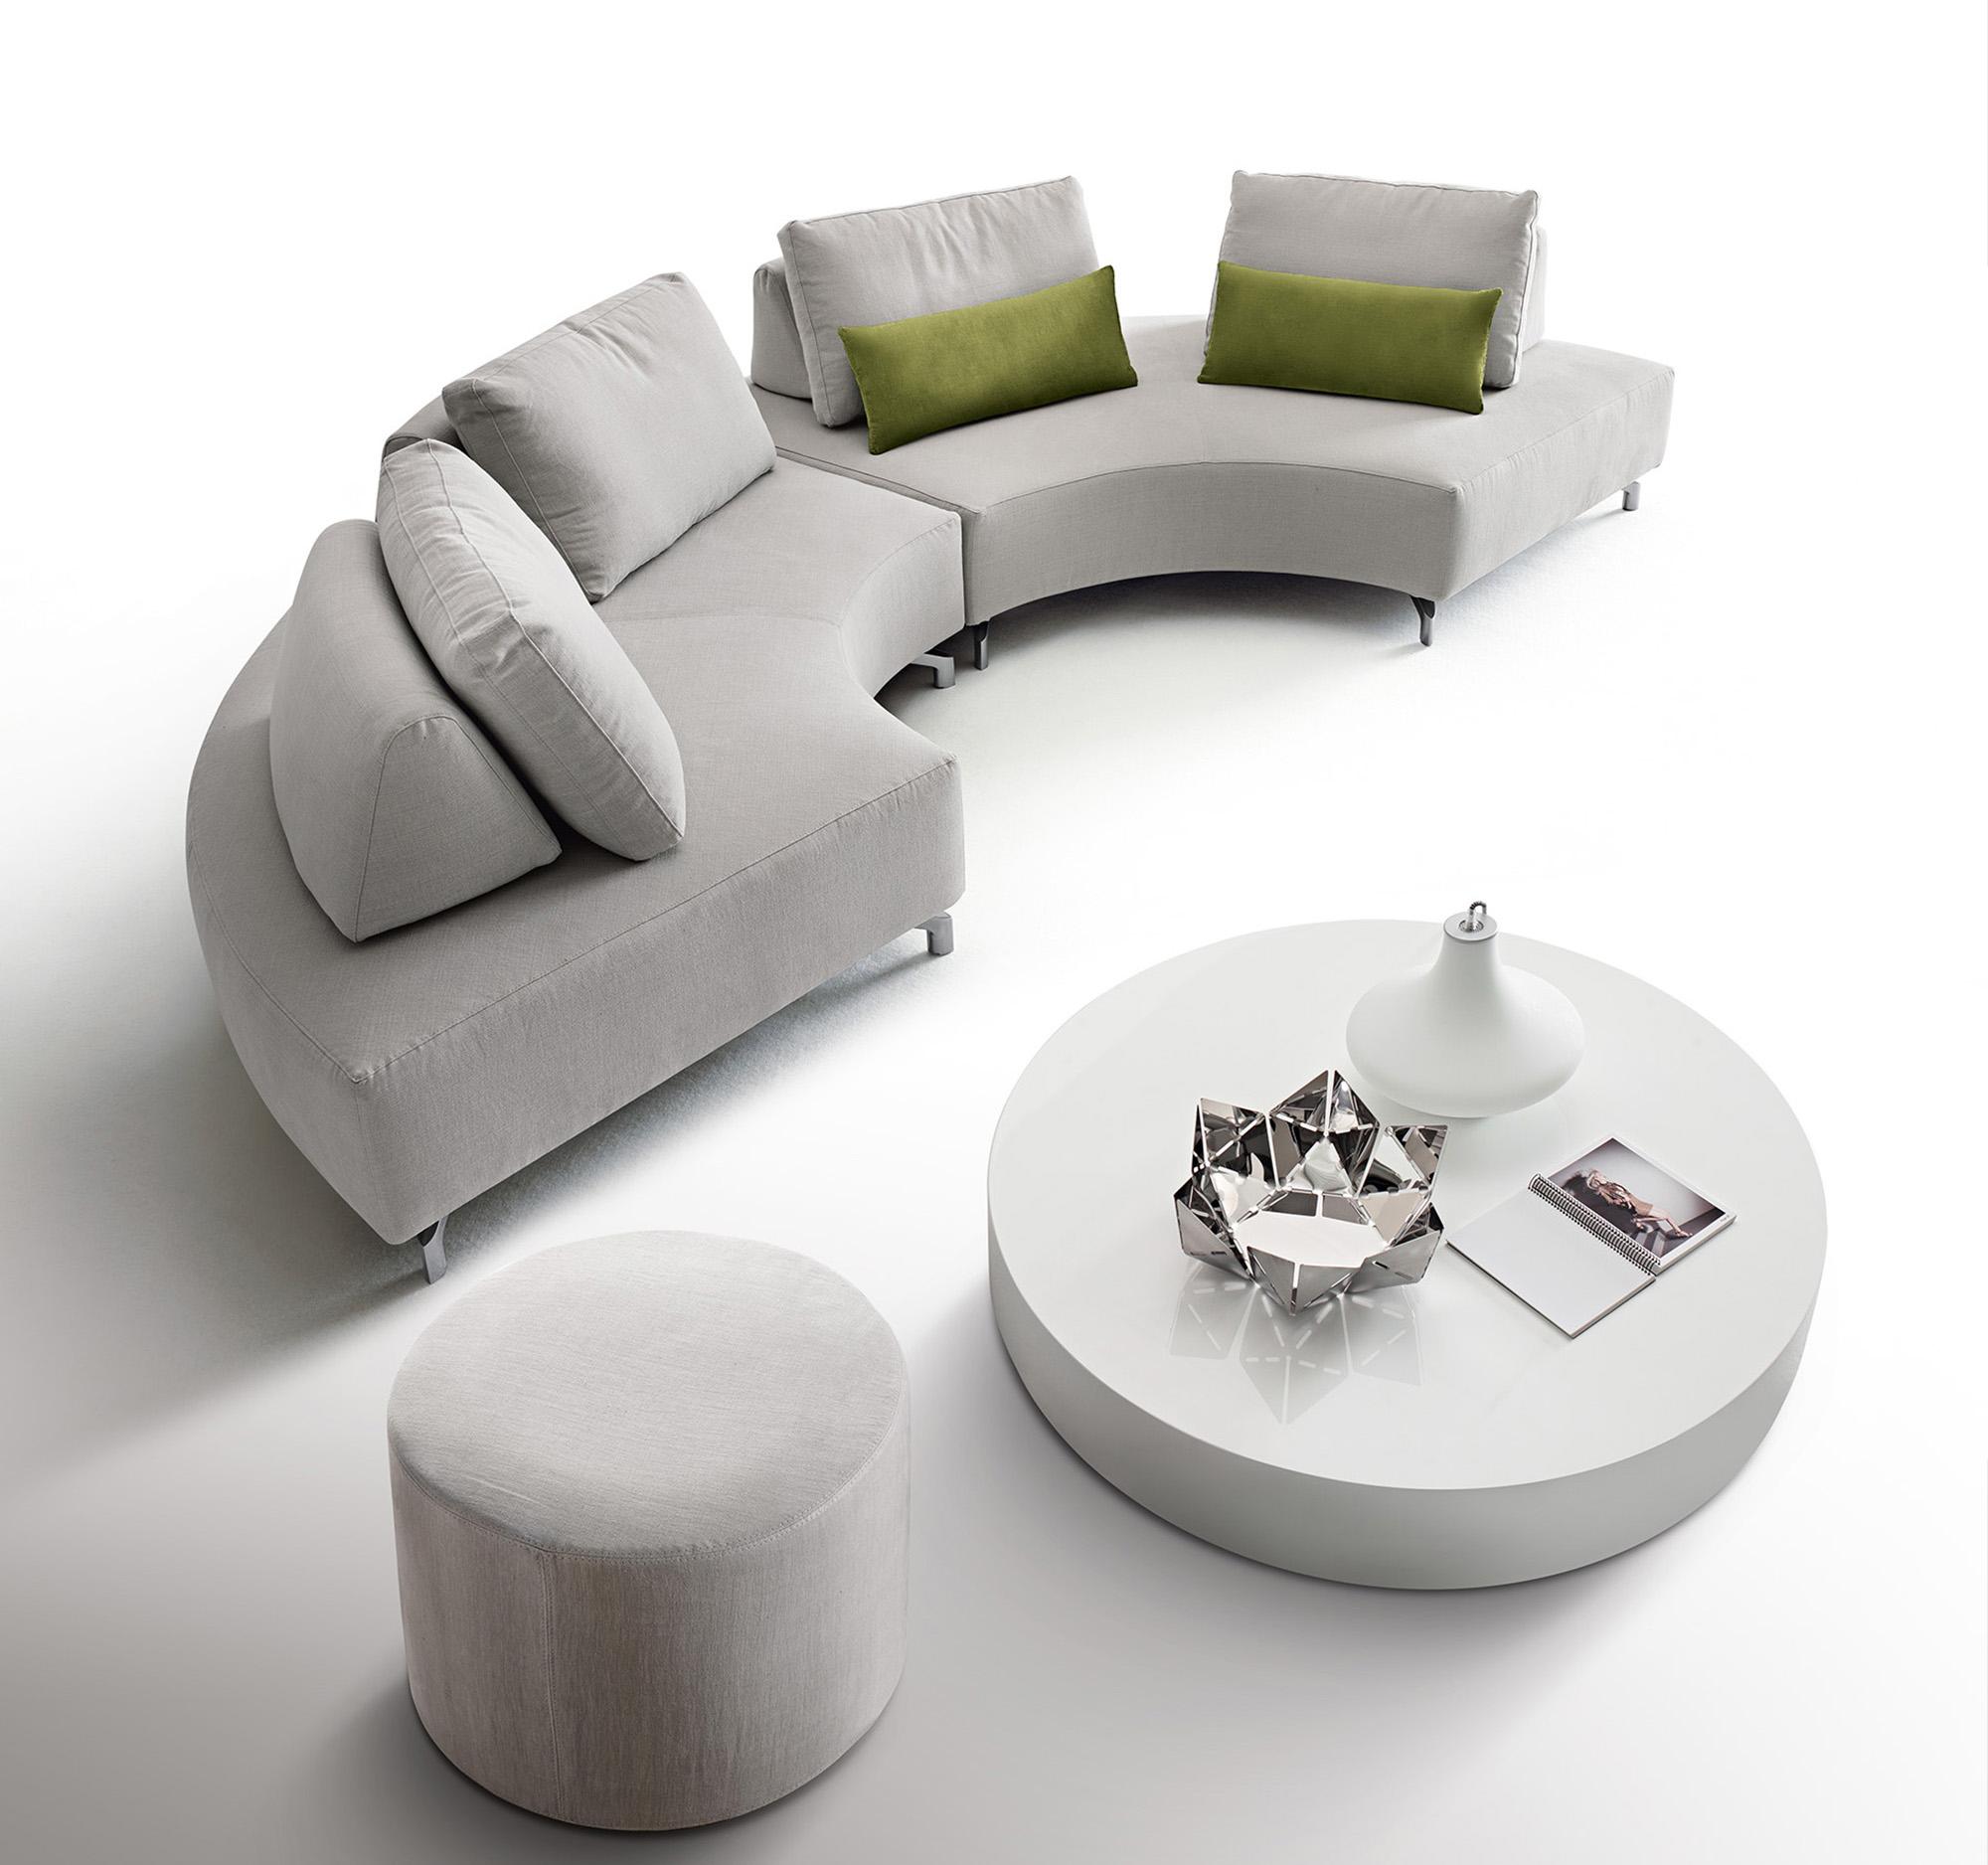 Divano Moderno A Semicerchio.Modular Sofa Fly Light Dema